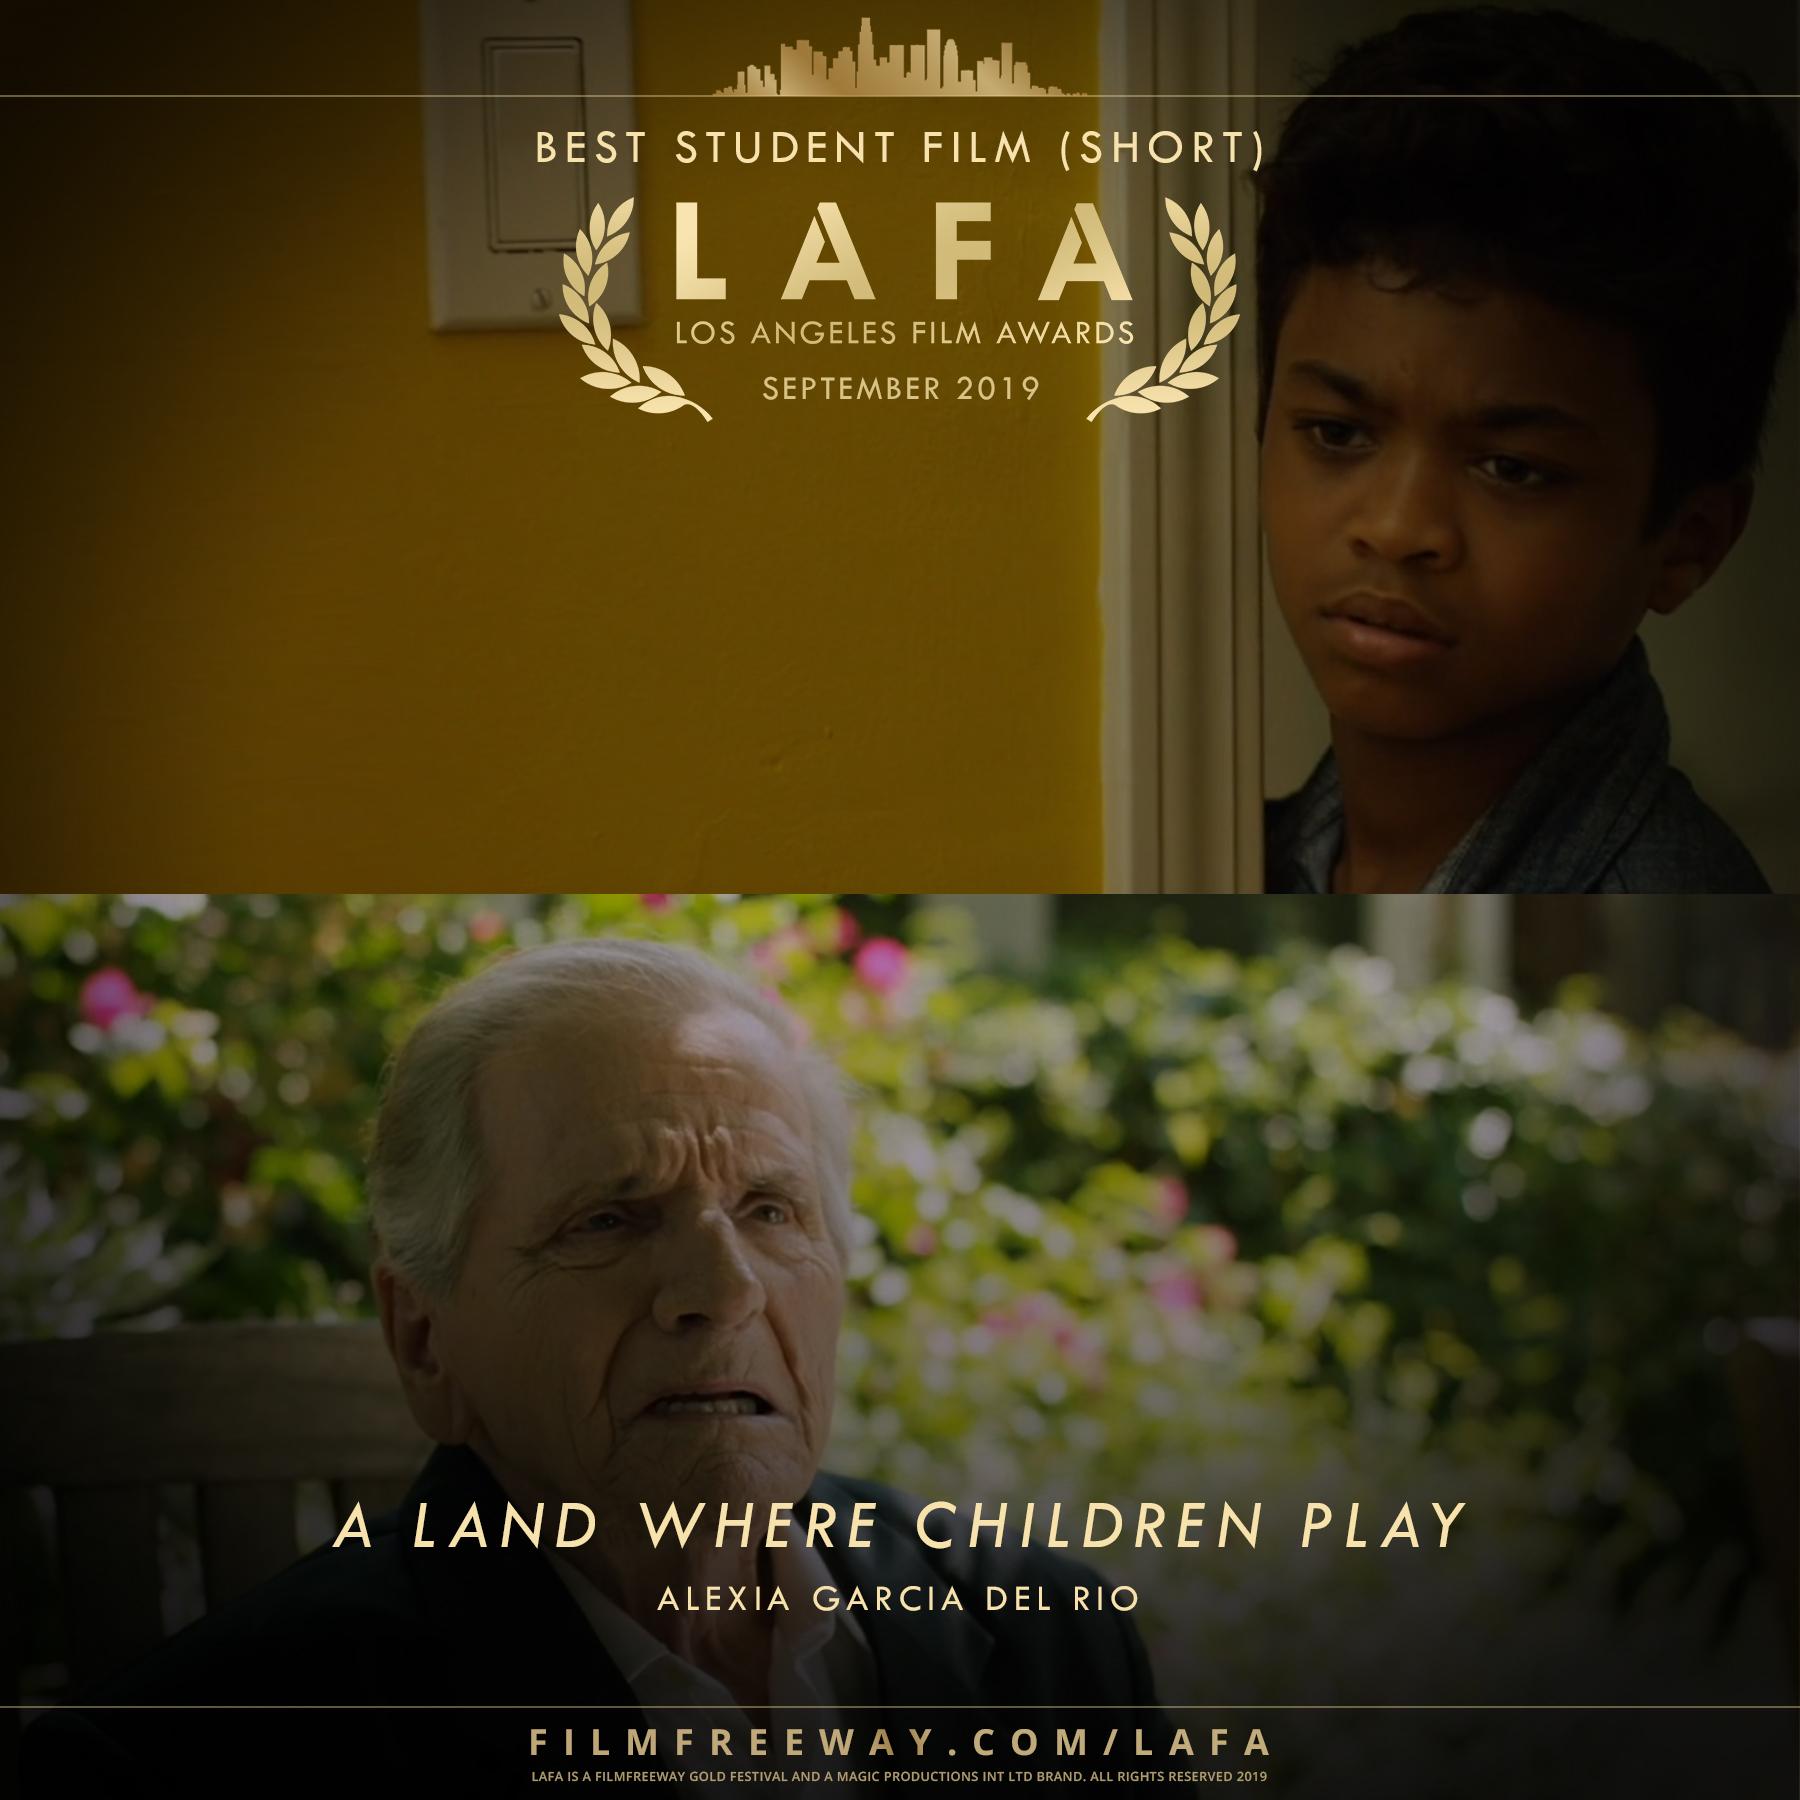 A LAND WHERE CHILDREN PLAY design